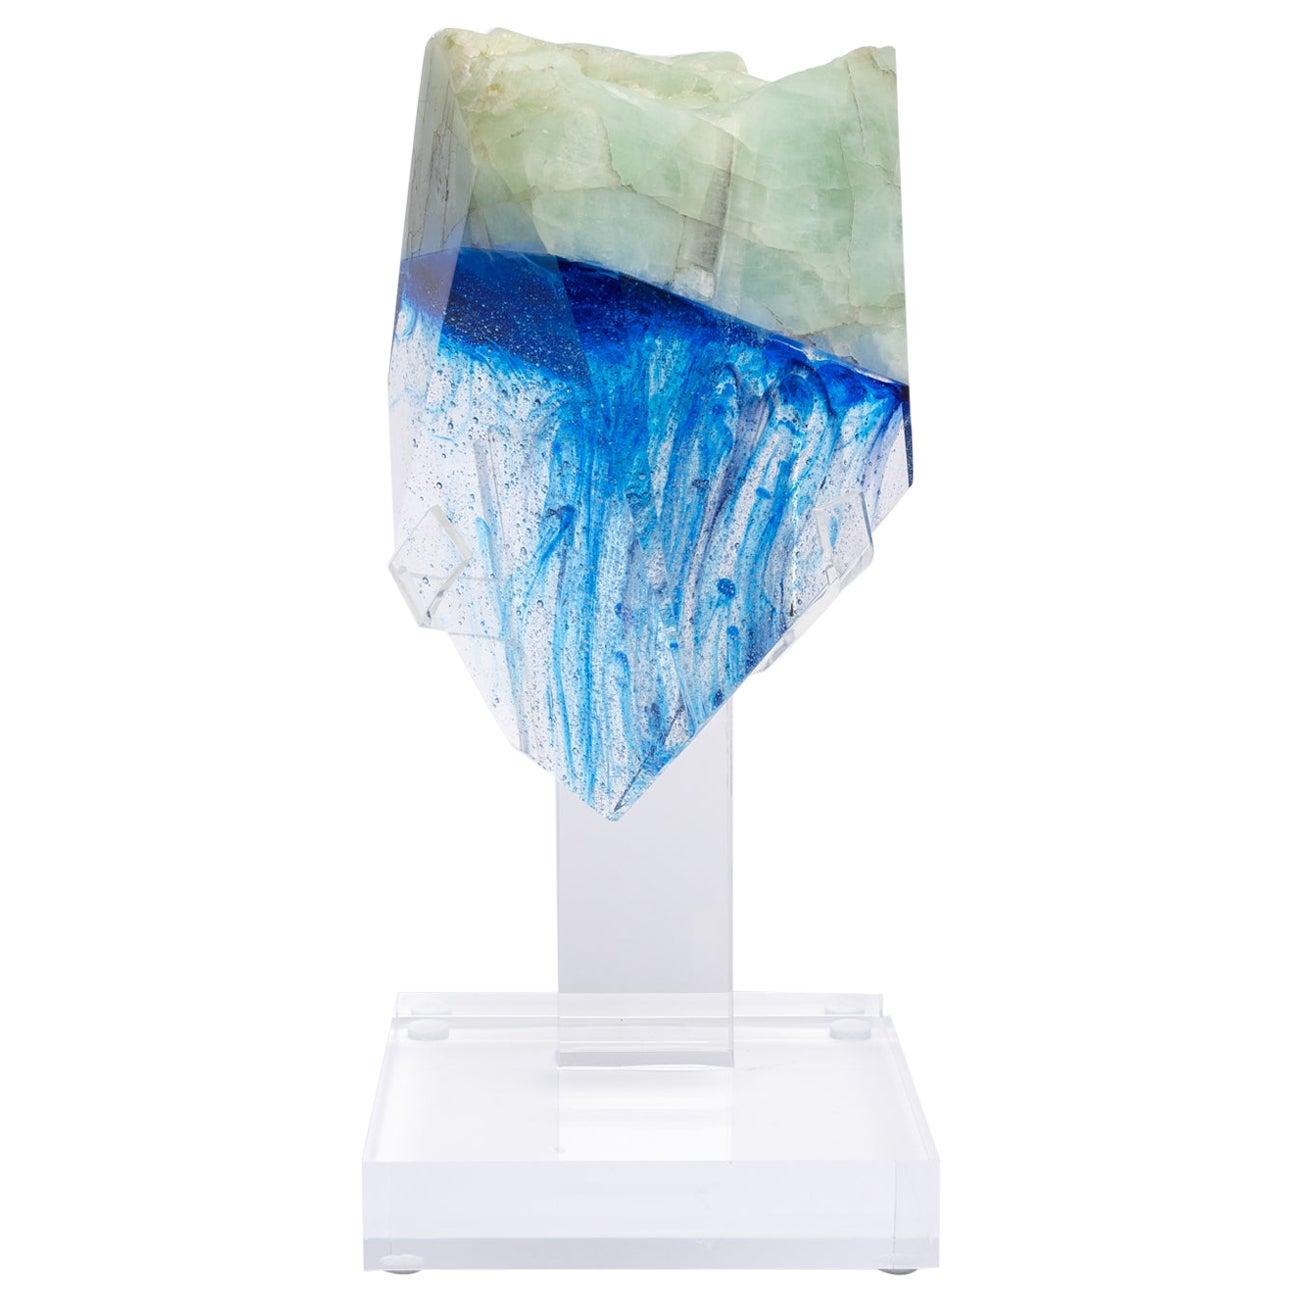 Brazilian Aquamarine and Blue Shade Organic Shape Glass Fusion Sculpture